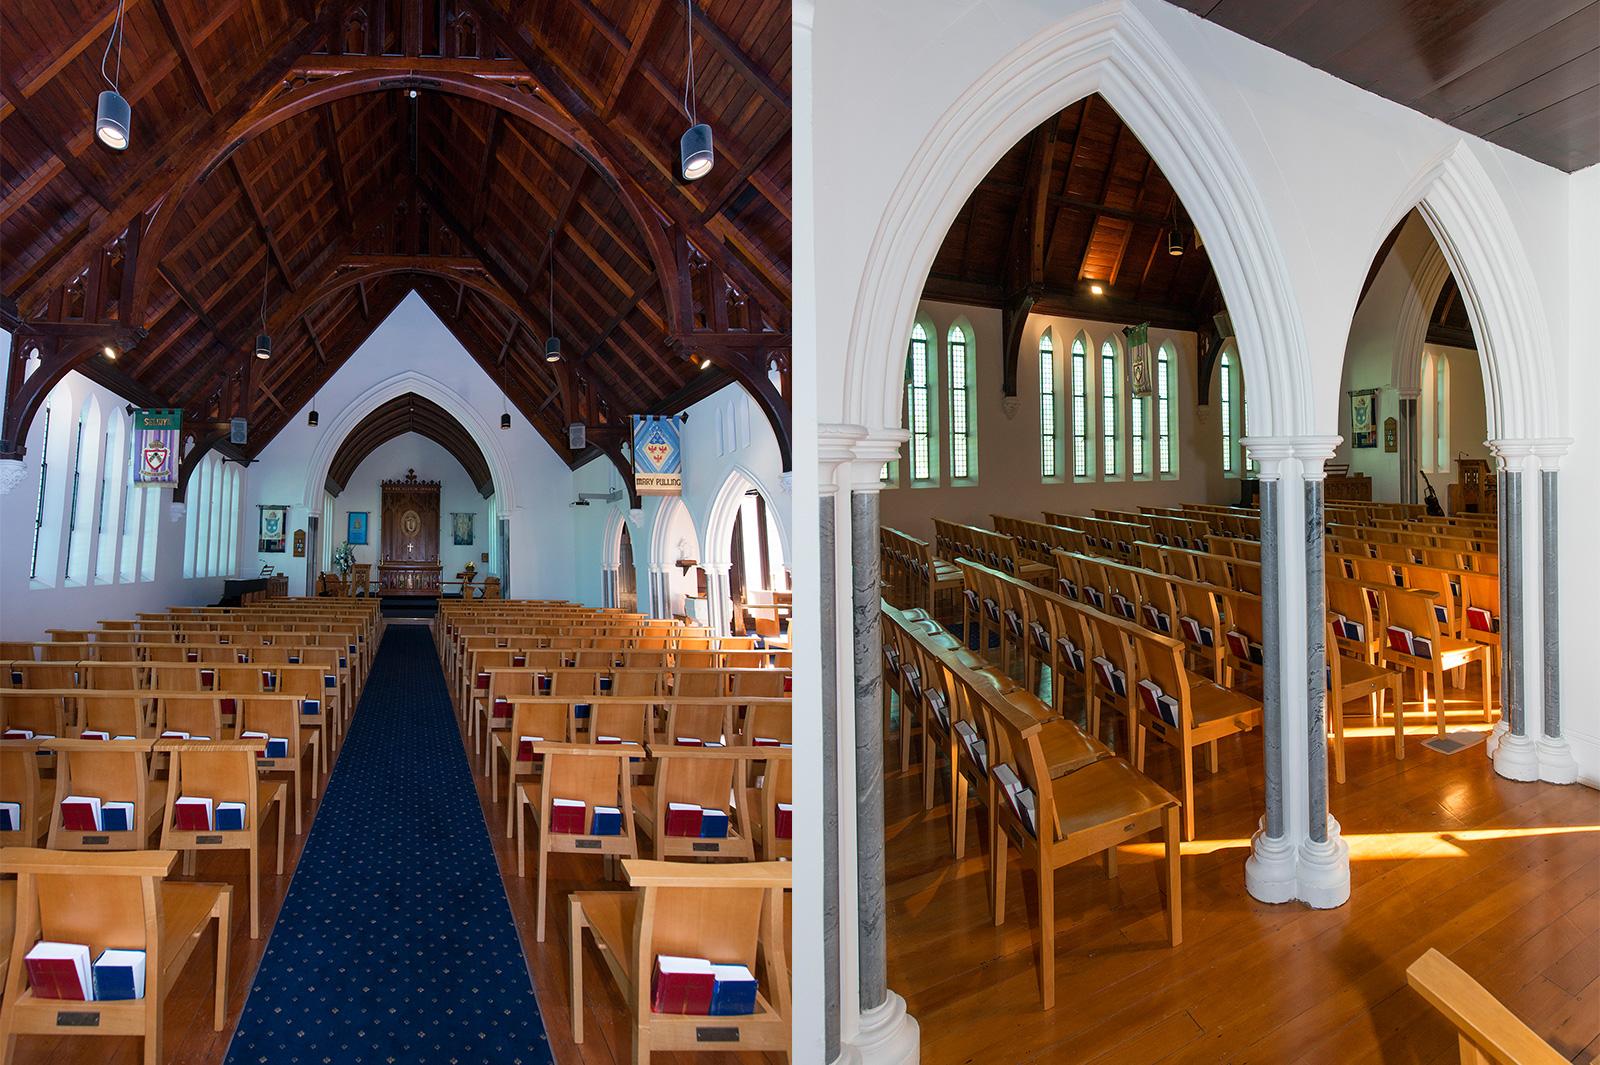 Construction-Company-Aspec-Diocesan-School-Chapel-Seismic-Upgrade-3-and-5